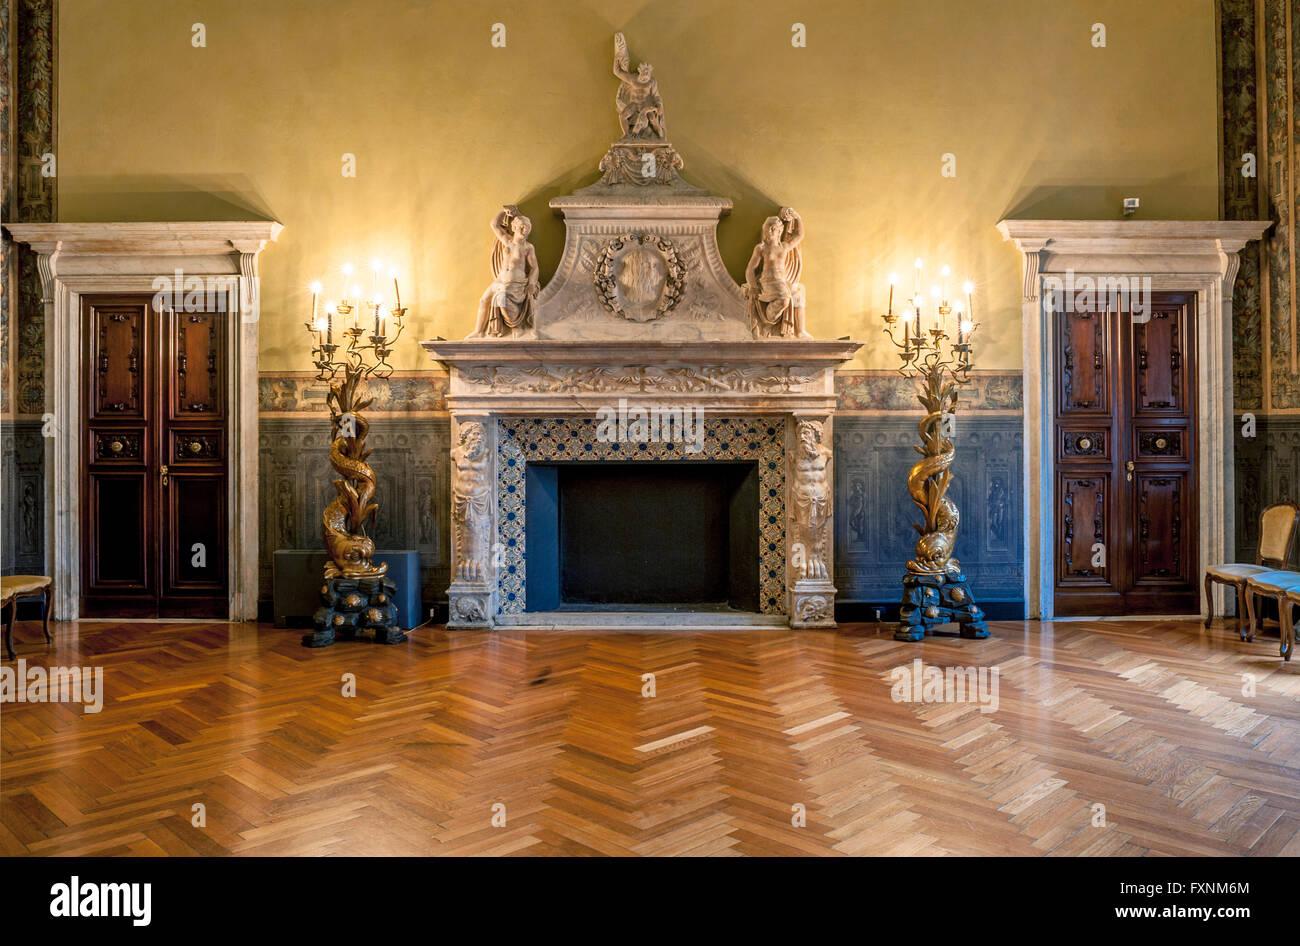 Italy Liguria Genoa - Piazza della Meridiana - Rolli Palace - Palace Gerolamo Grimaldi Sec XVI - Palazzo della Meridiana Stock Photo